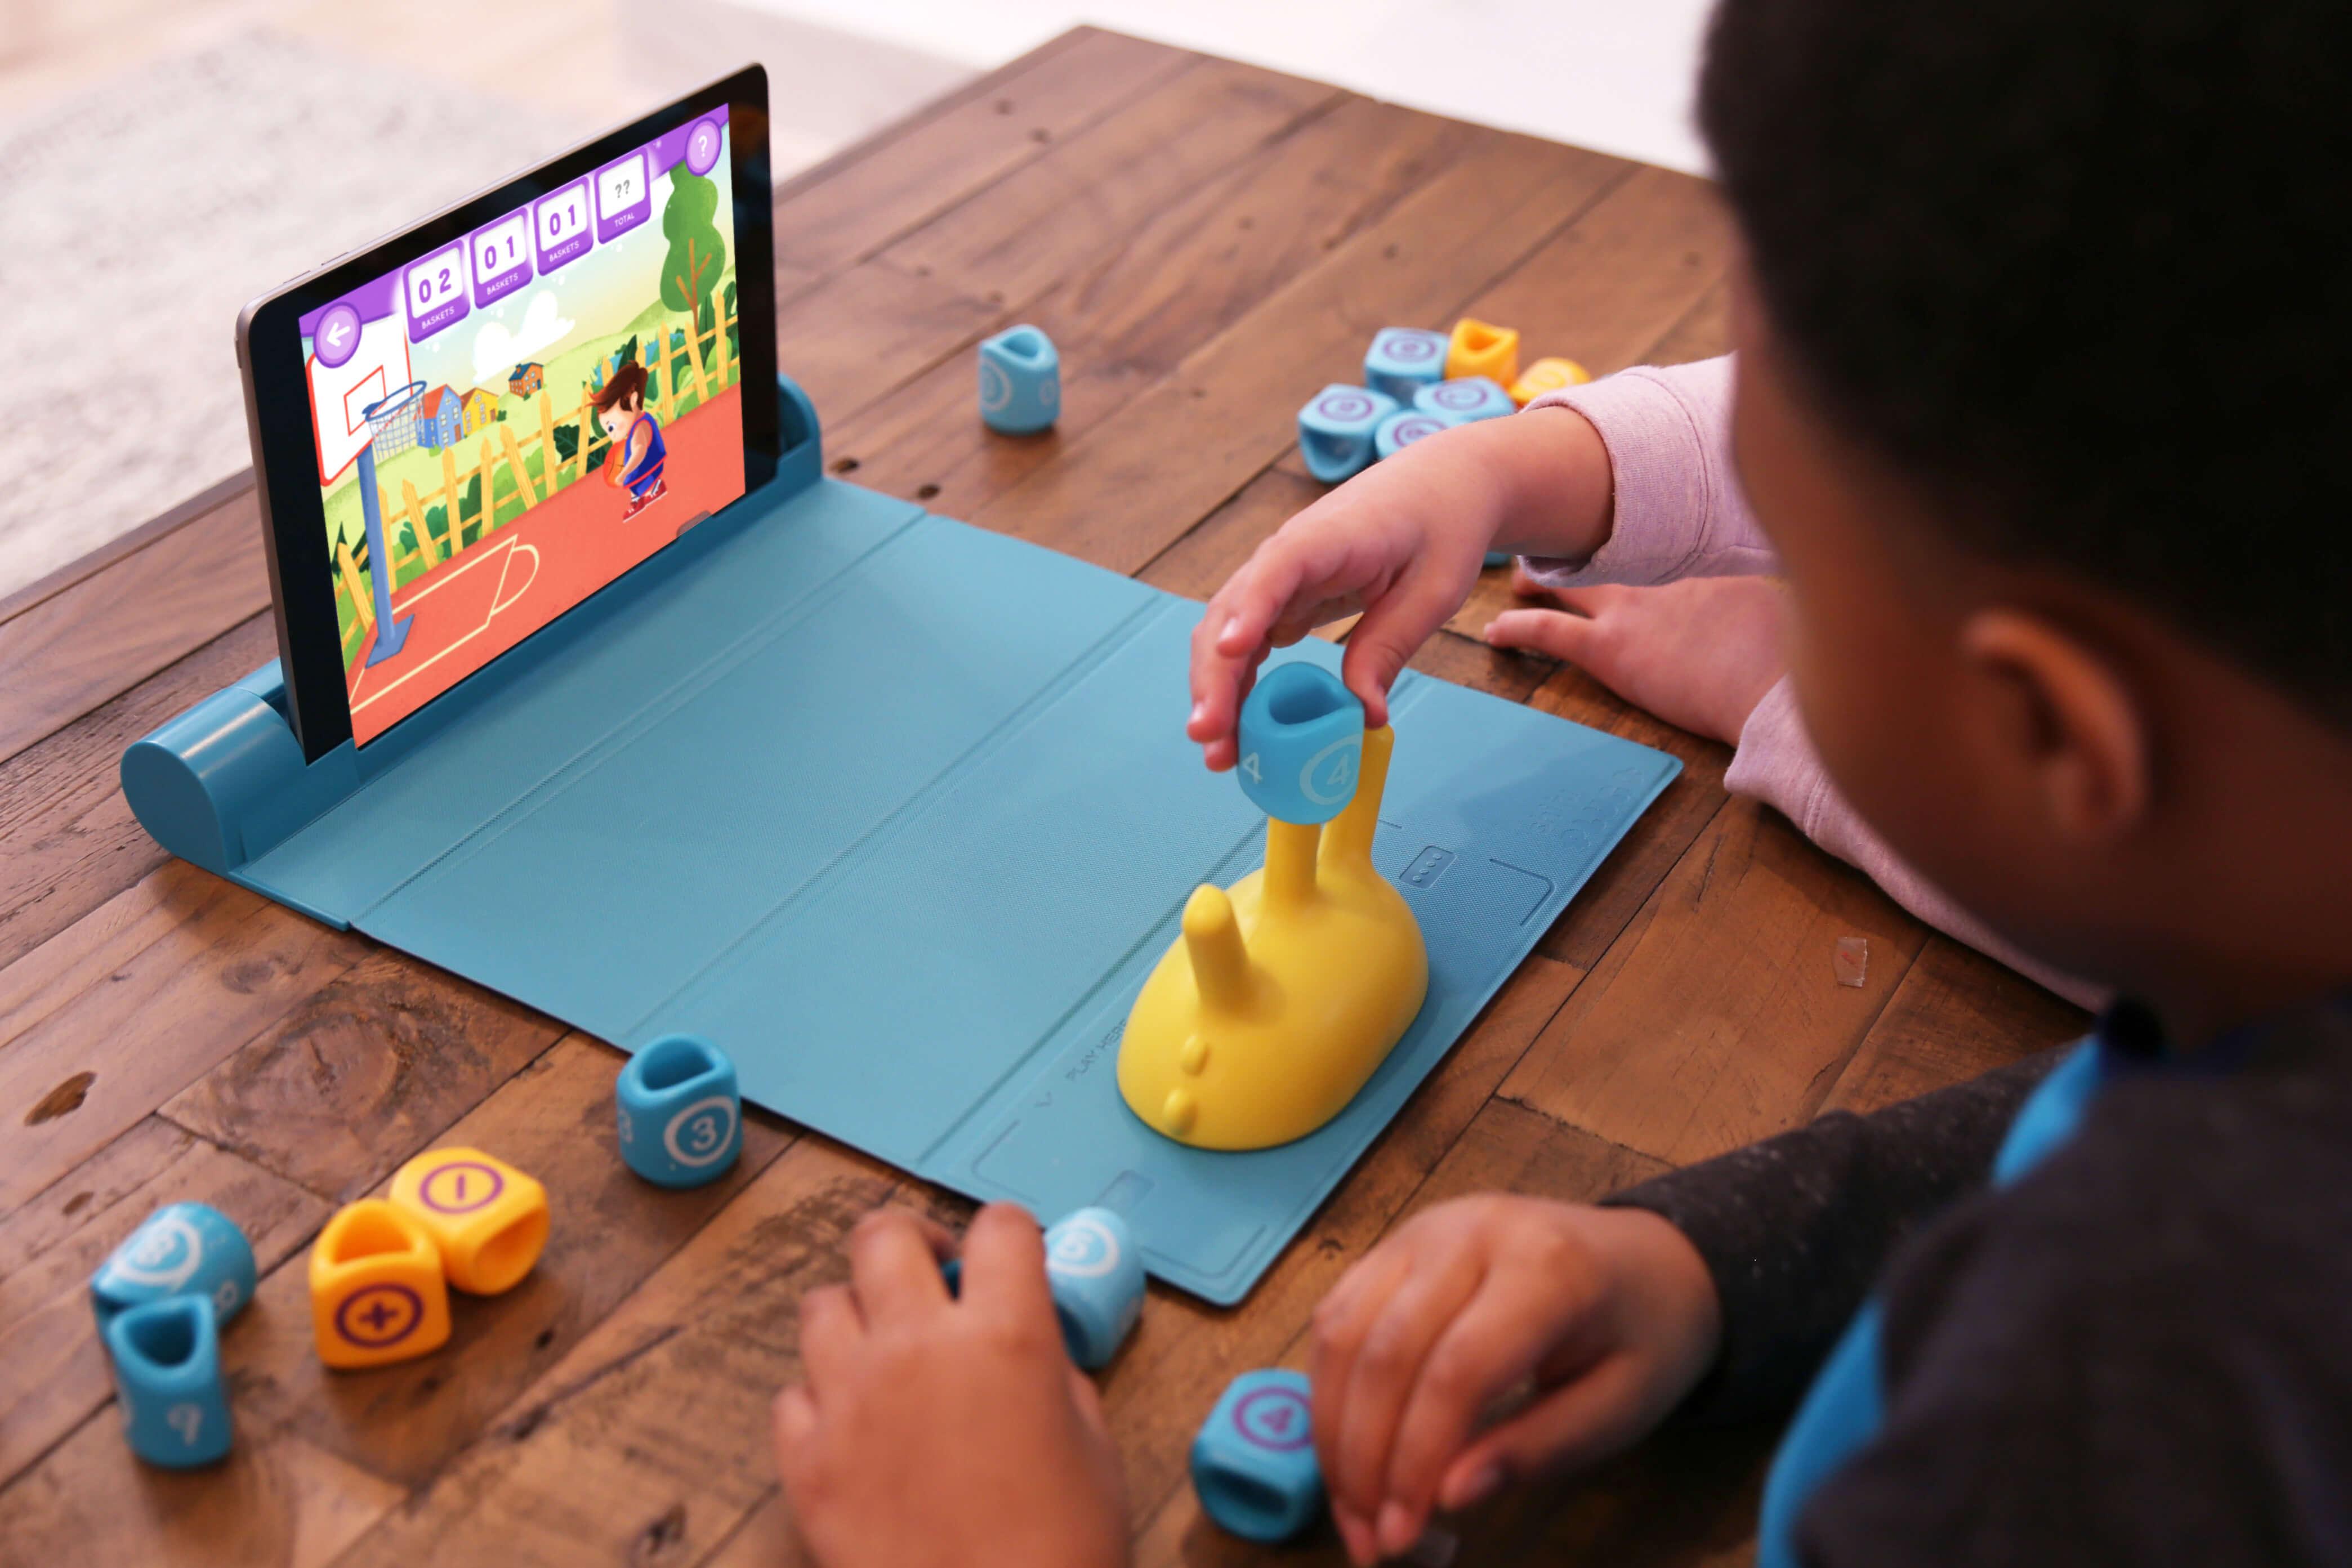 Kids can use PlayShifu to learn STEM skills